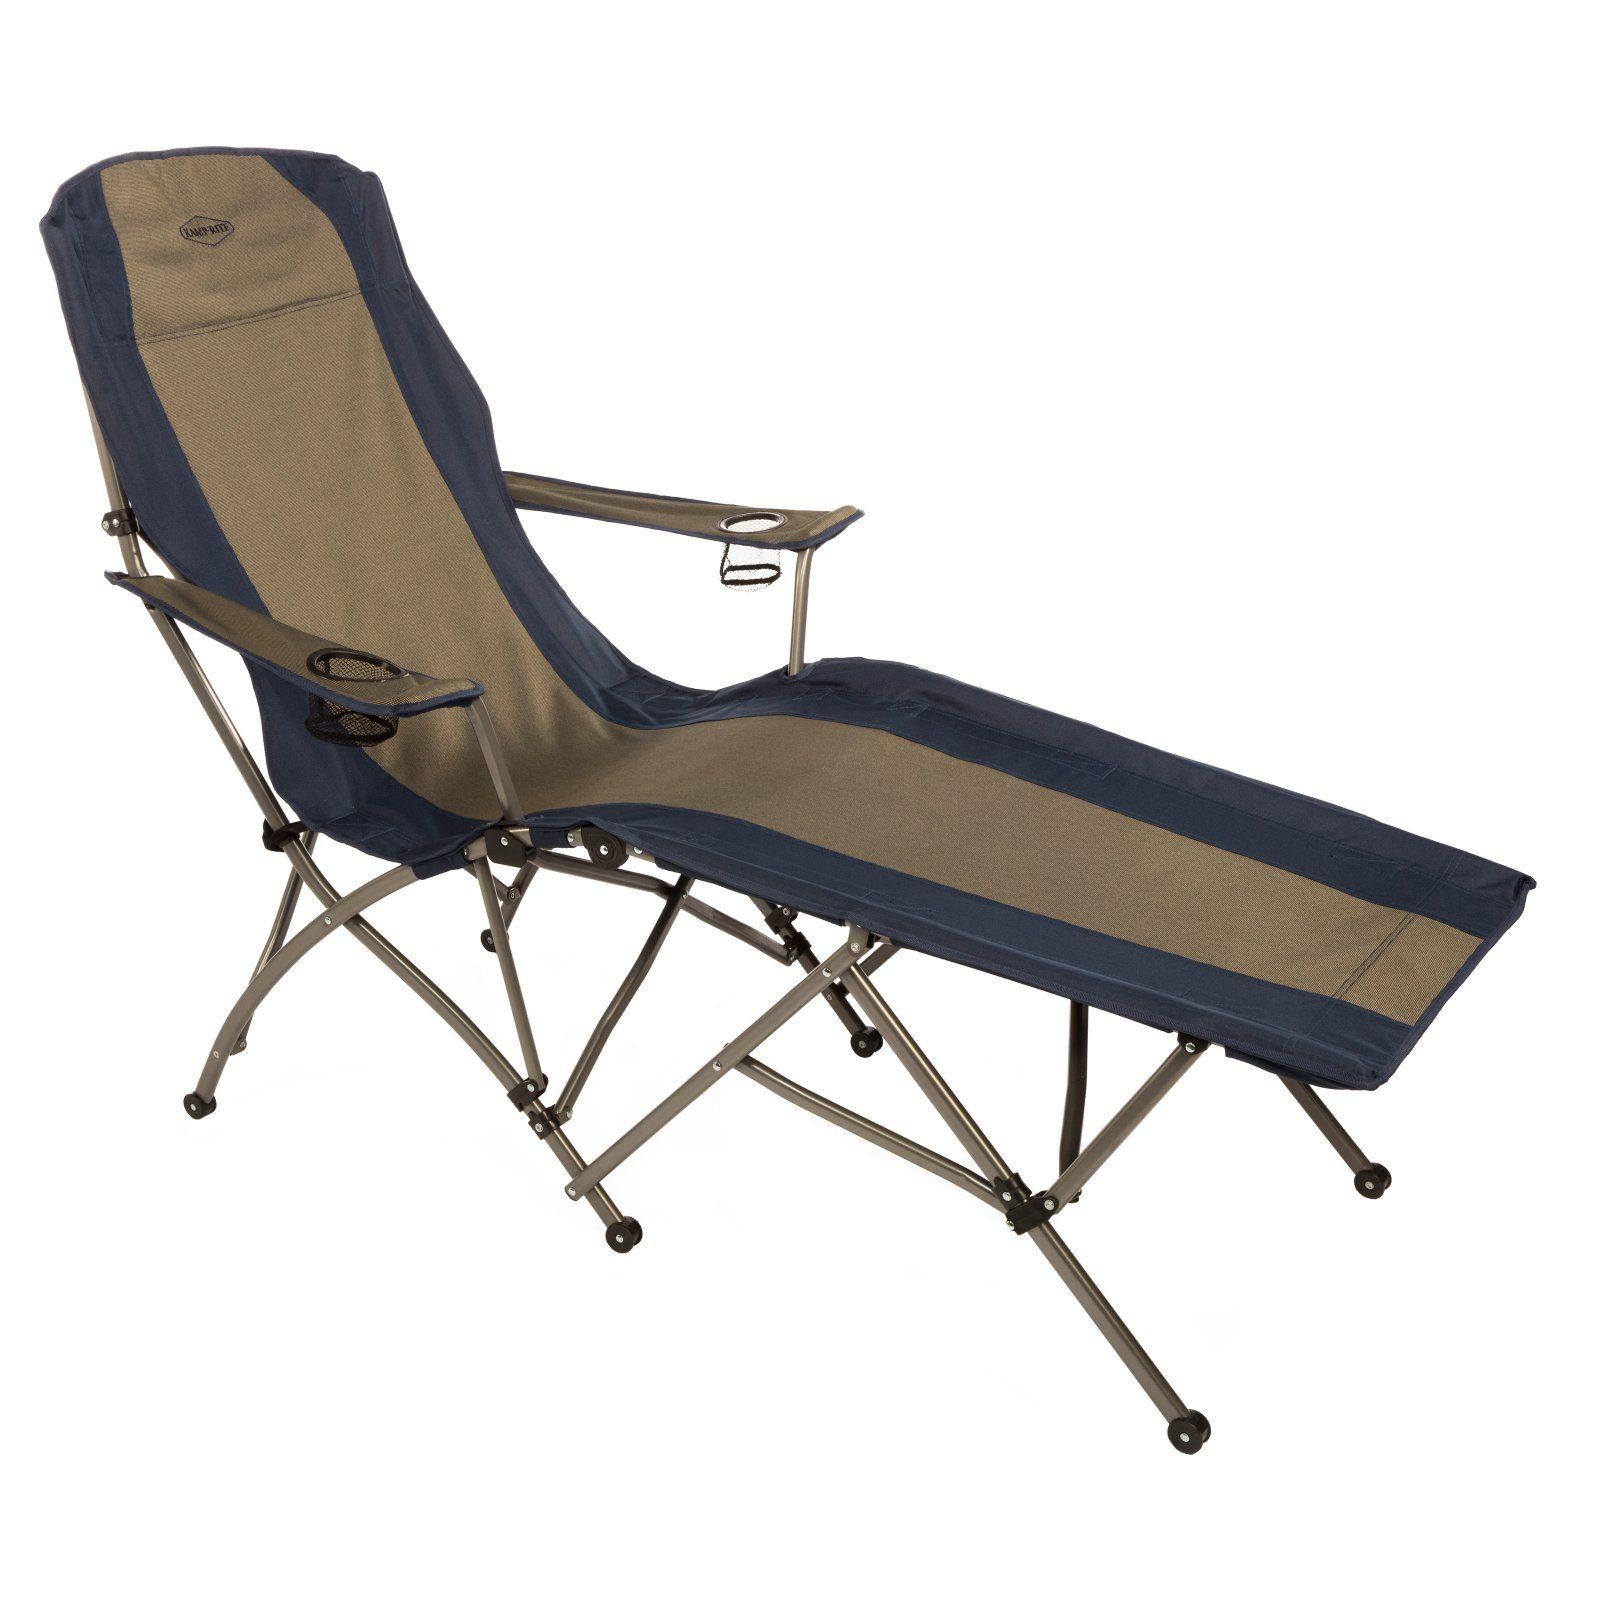 Outdoor Kamp Rite Soft Arm Folding Chaise Lounge Chair Folding